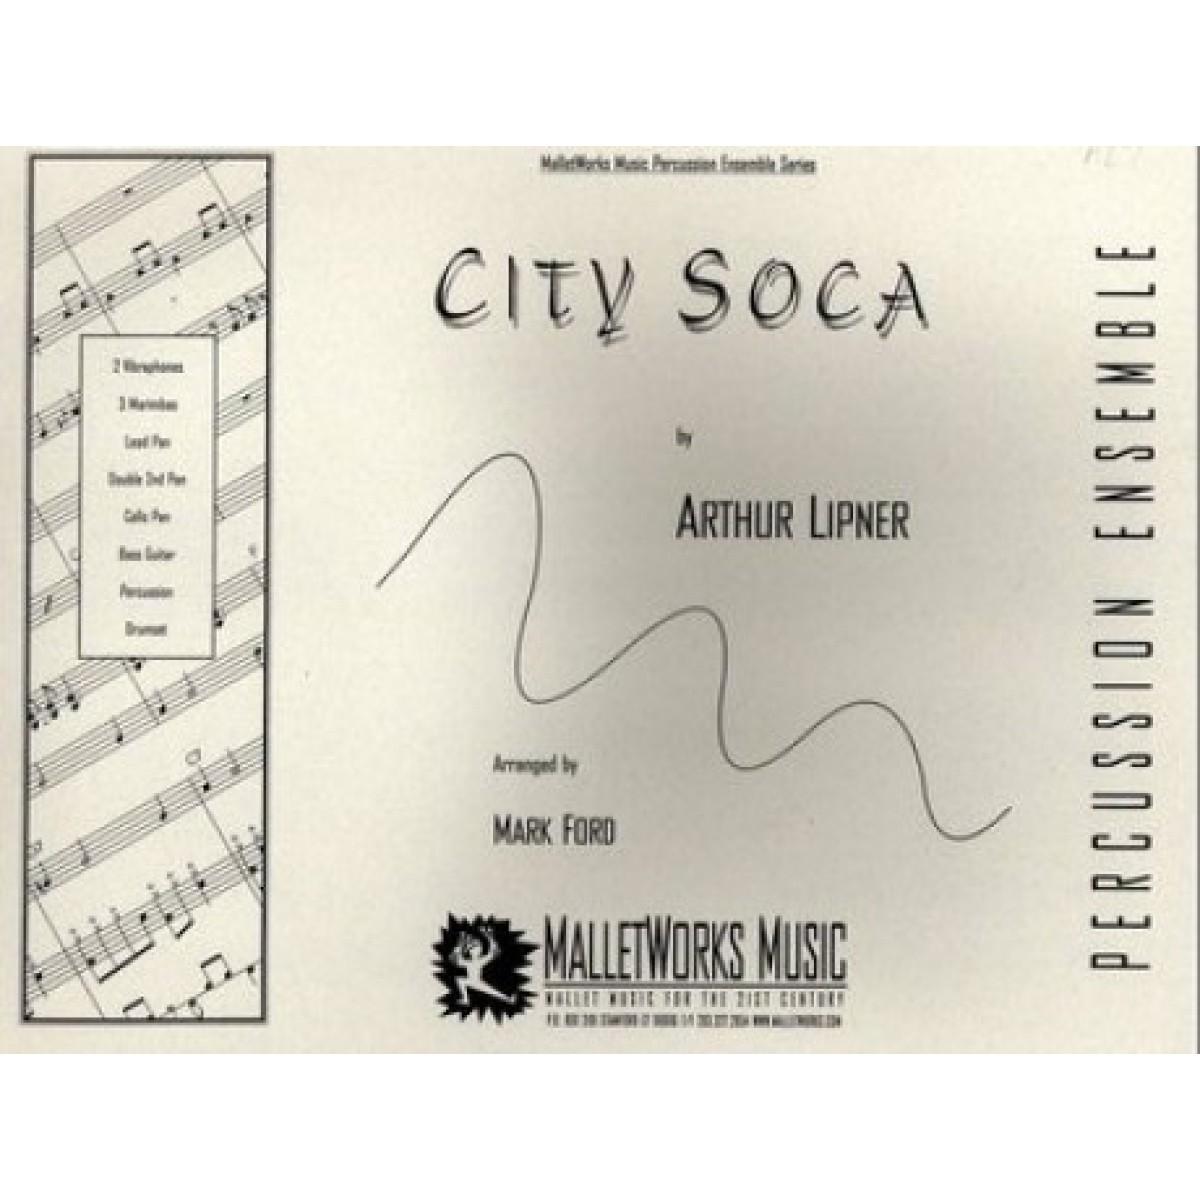 City Soca